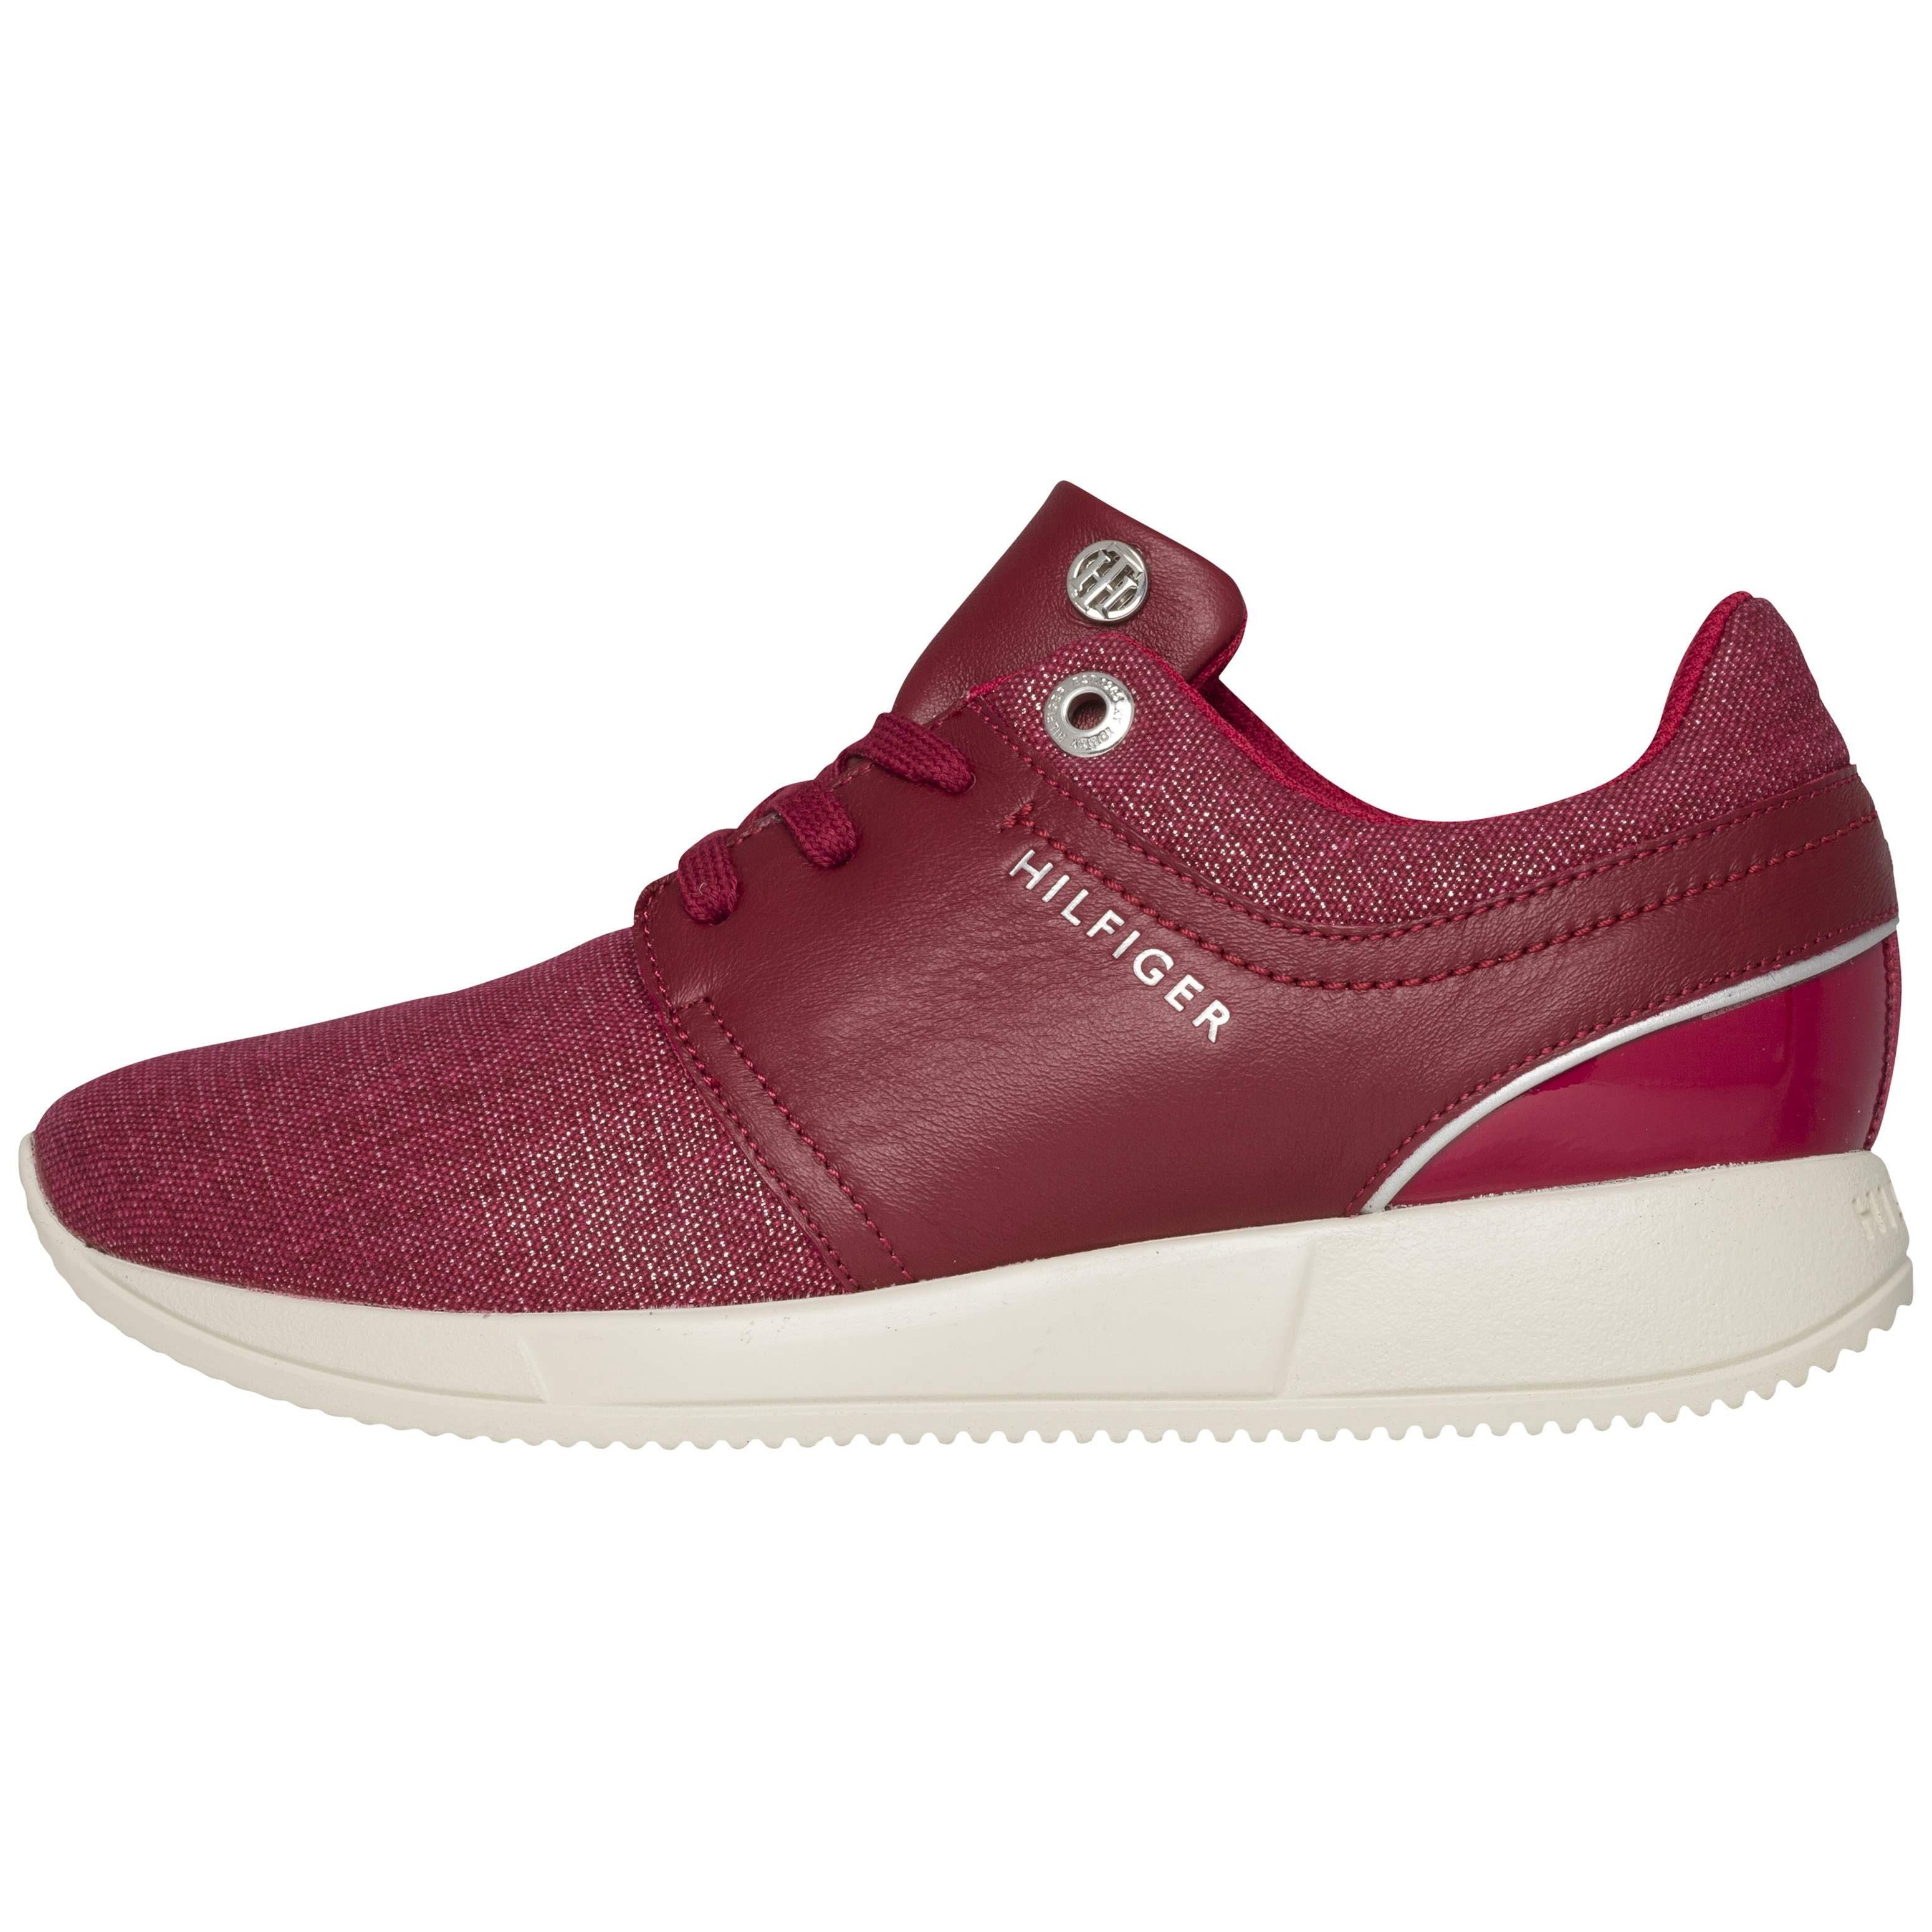 Tommy Hilfiger Sneaker S1285AMANTHA 2C4 kaufen  SCOOTER RED